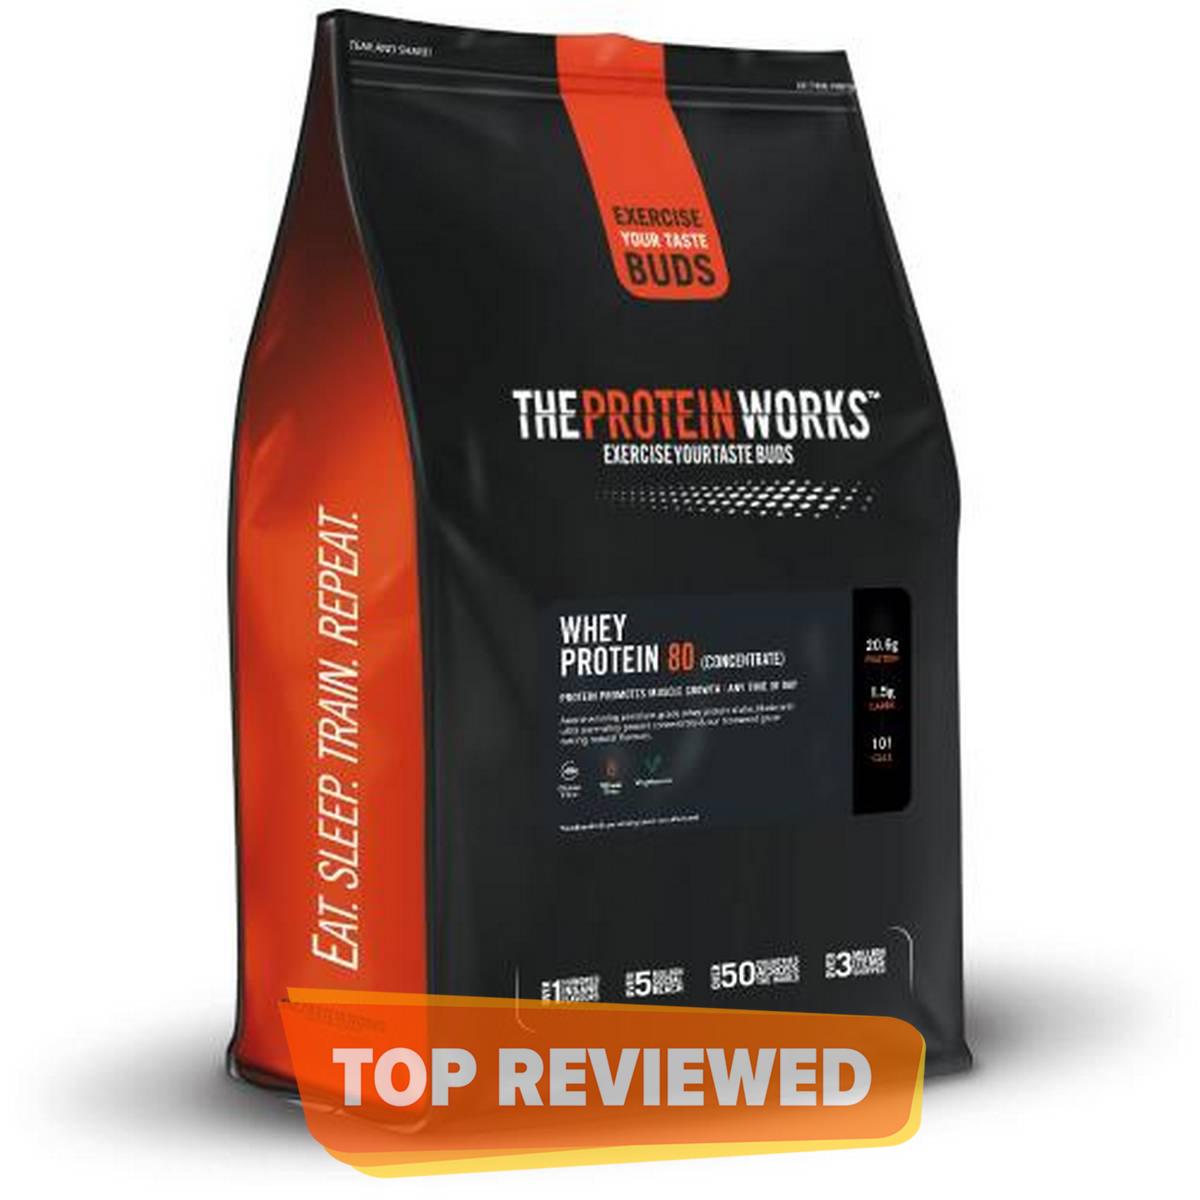 The Protein Works Whey Protein 80 - 2 kg (4.4 lbs) - Vanilla Creme